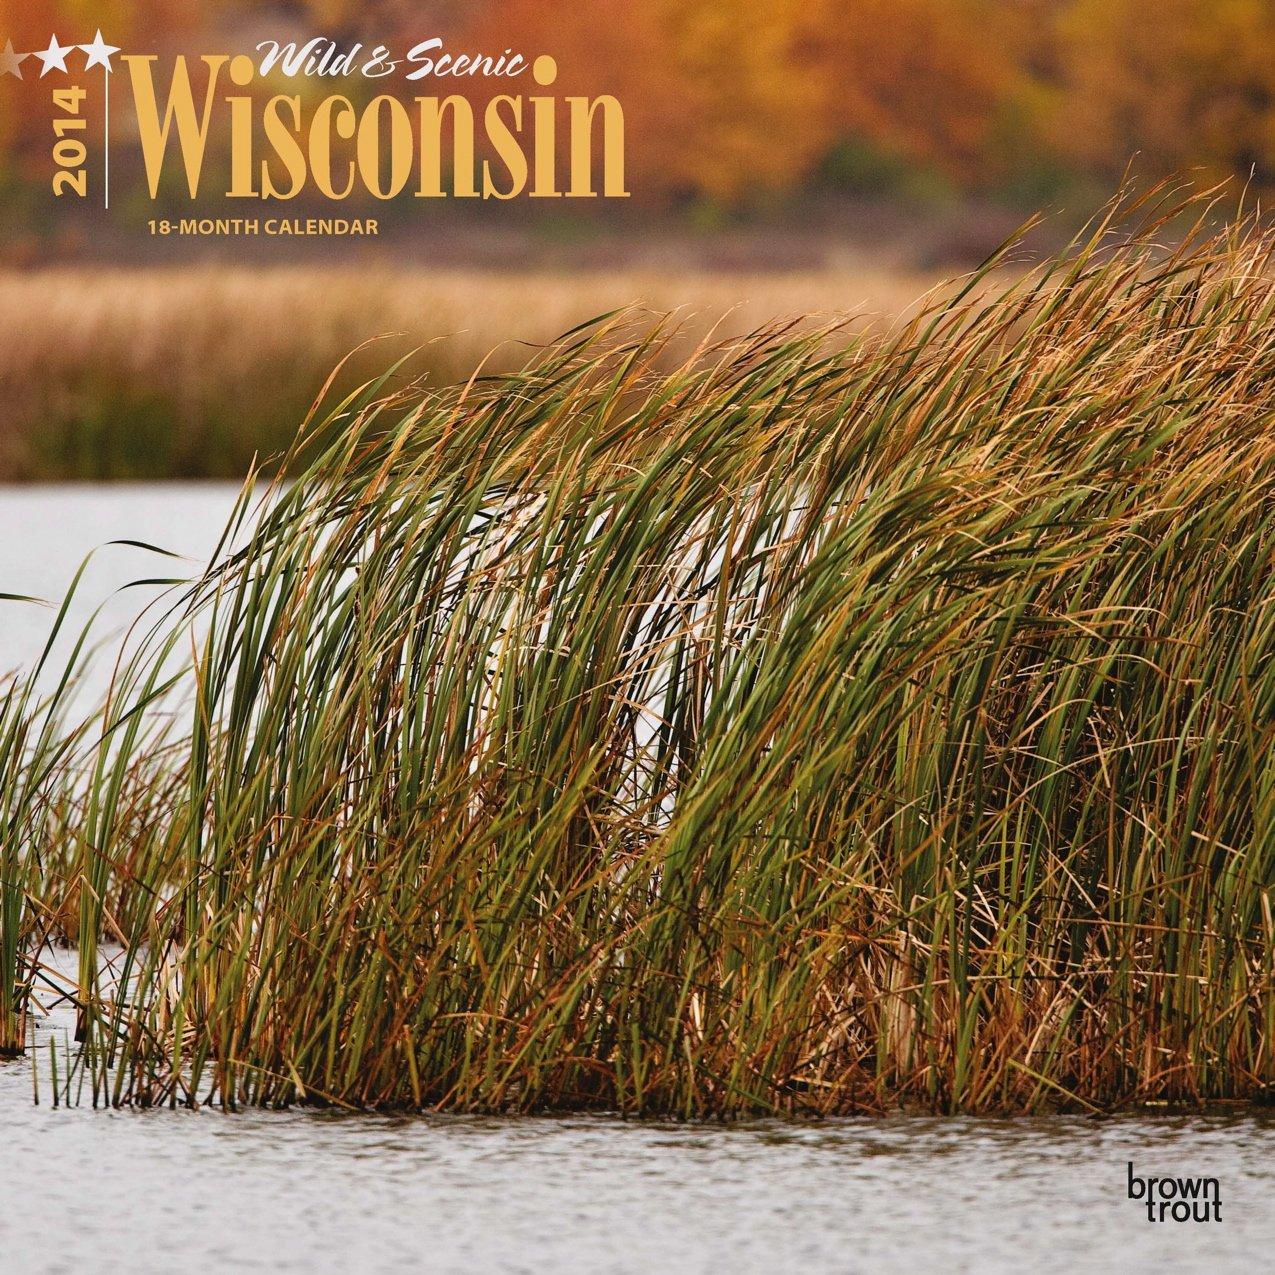 Wild & Scenic Wisconsin 18-Month 2014 Calendar (Multilingual Edition) PDF